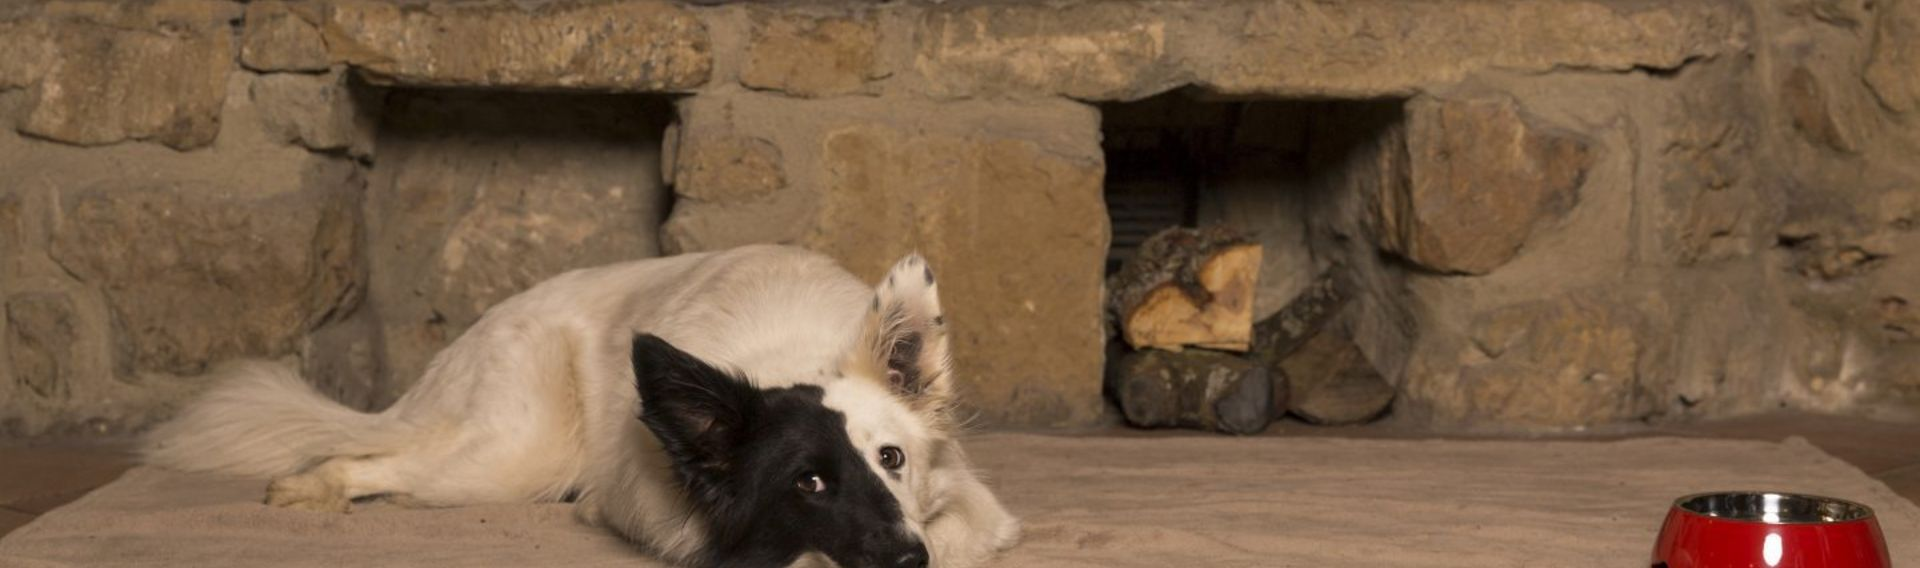 Urlaub mit Hundeschule, Hundepension – MuppenTrupp